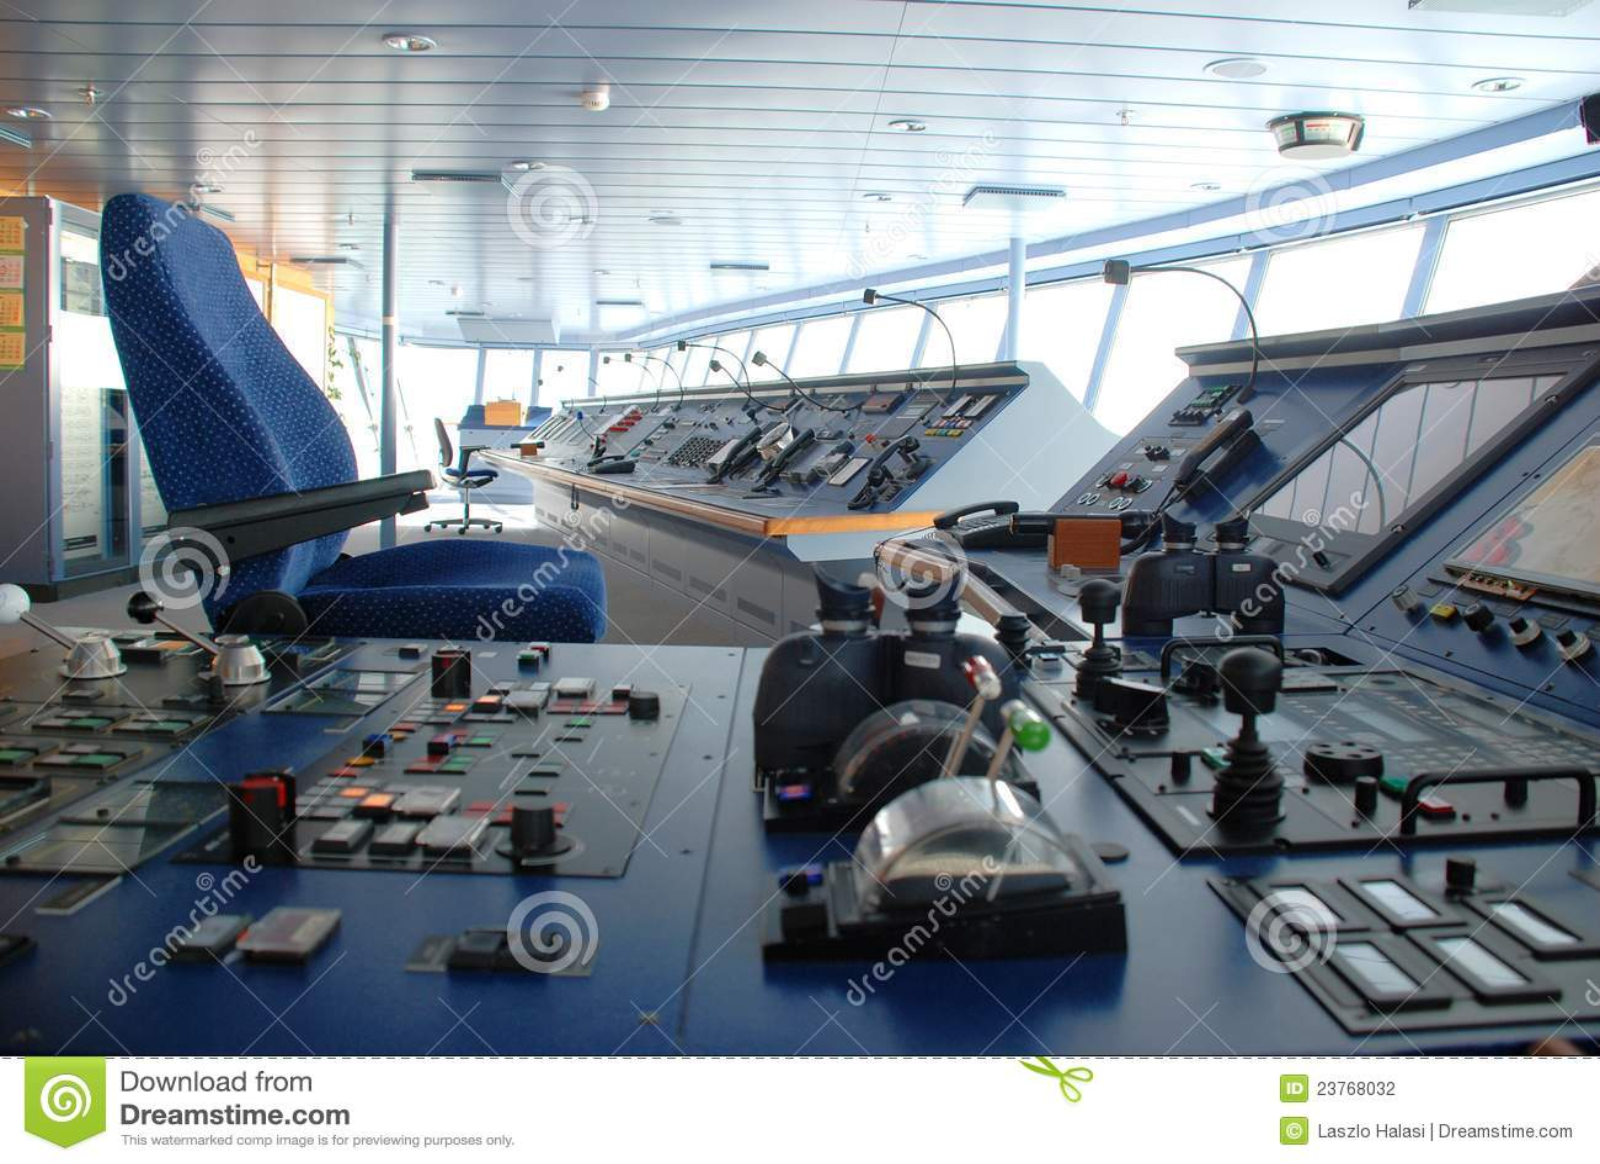 Cruise Ship Bridge Inside Stock Illustration Illustration Of - Cruise ship controls